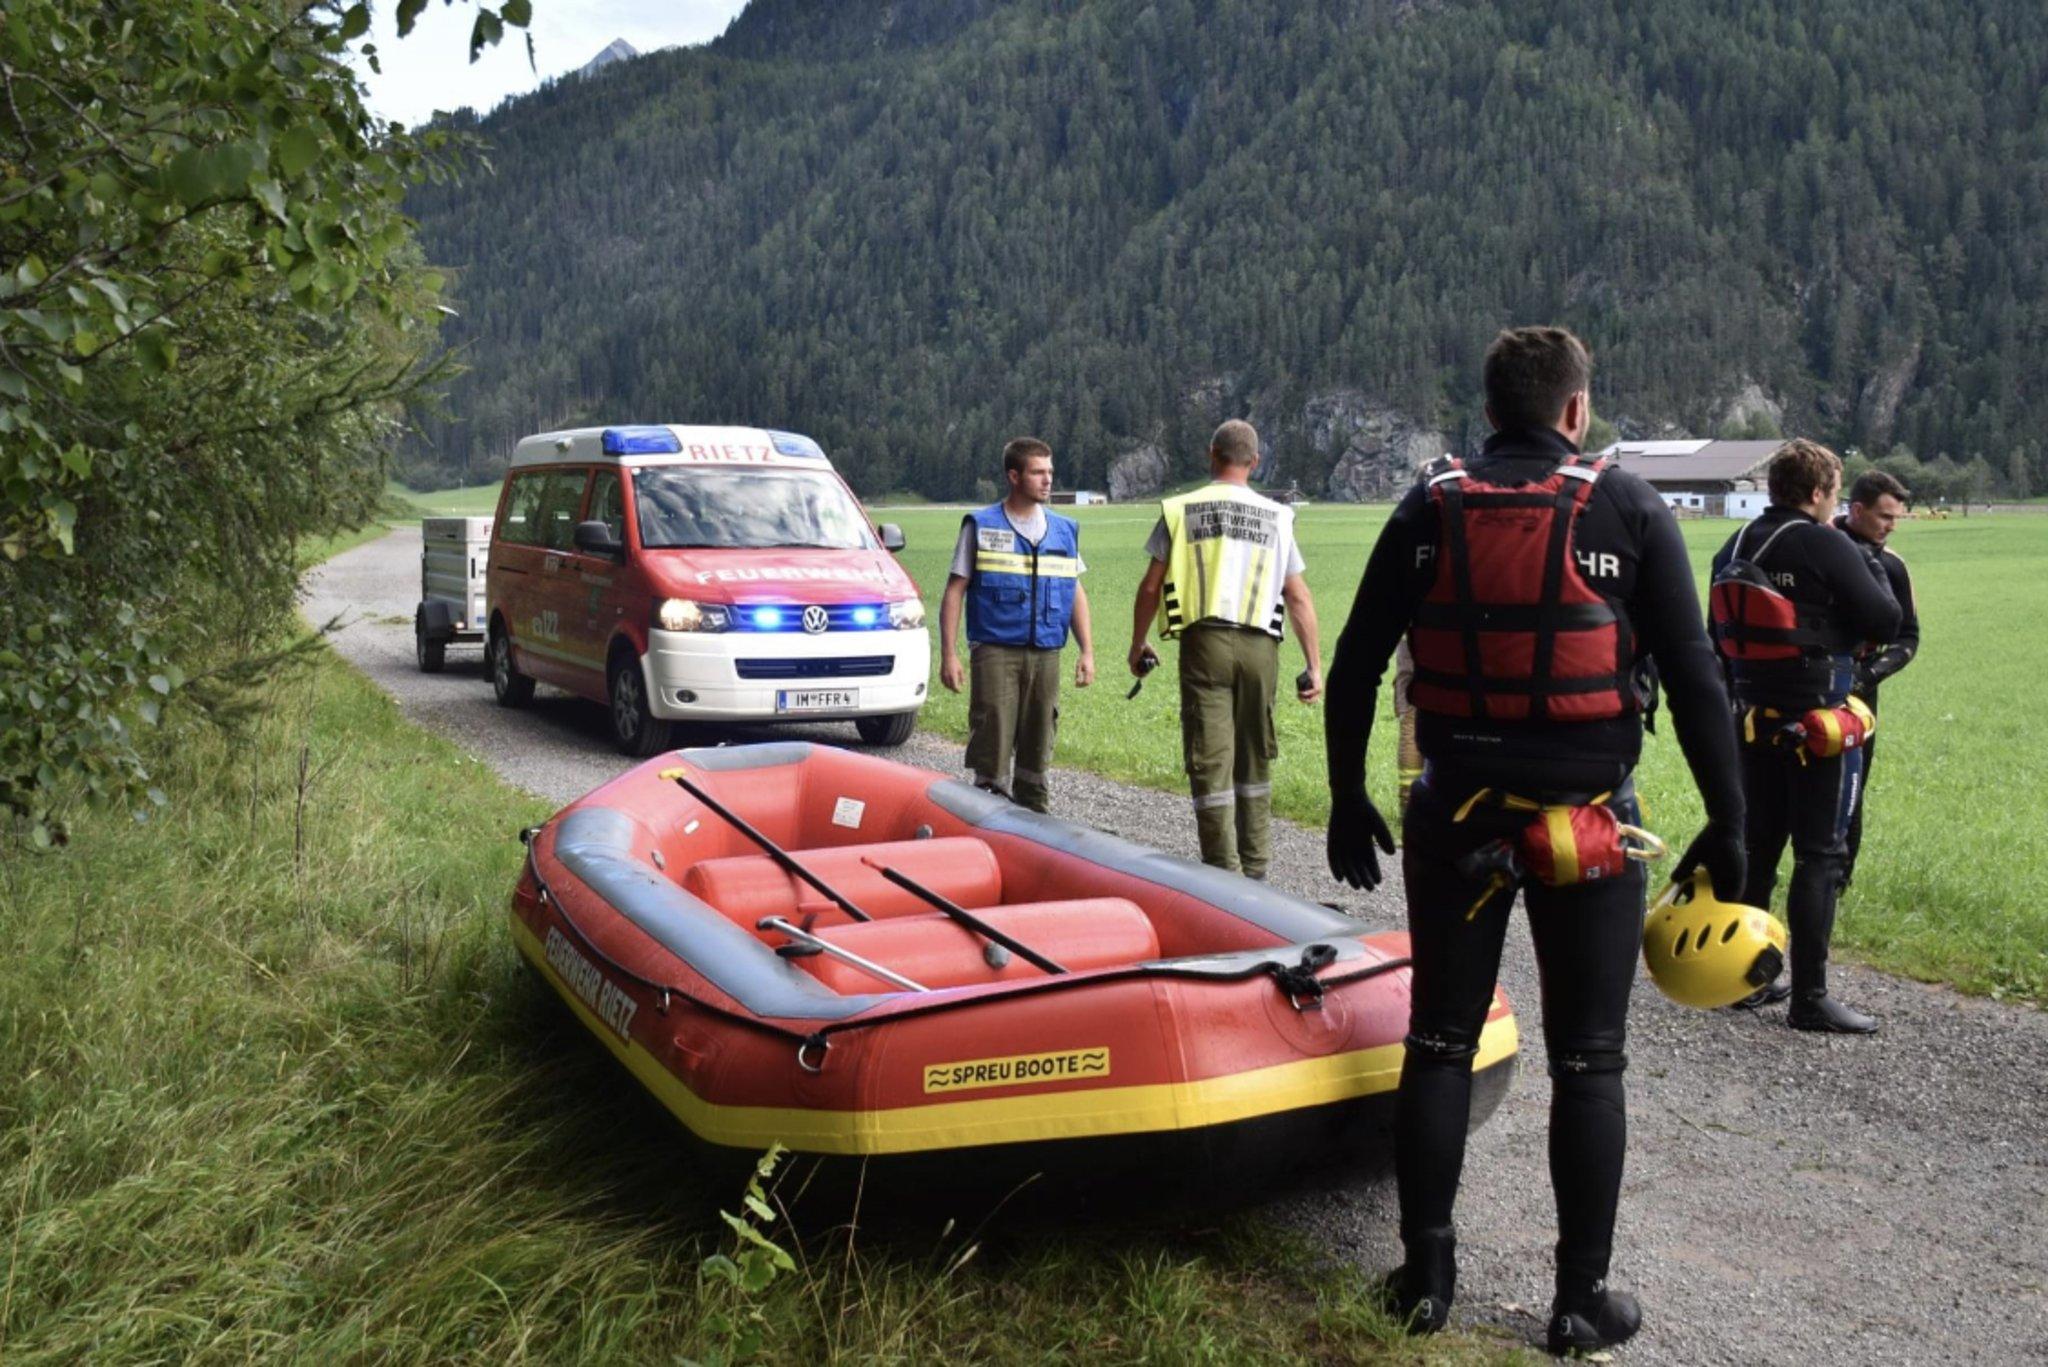 Kajakunfall Ötztaler Ache - Einsatzkräfte bei der Bergung, (c) Foto FF Längenfeld